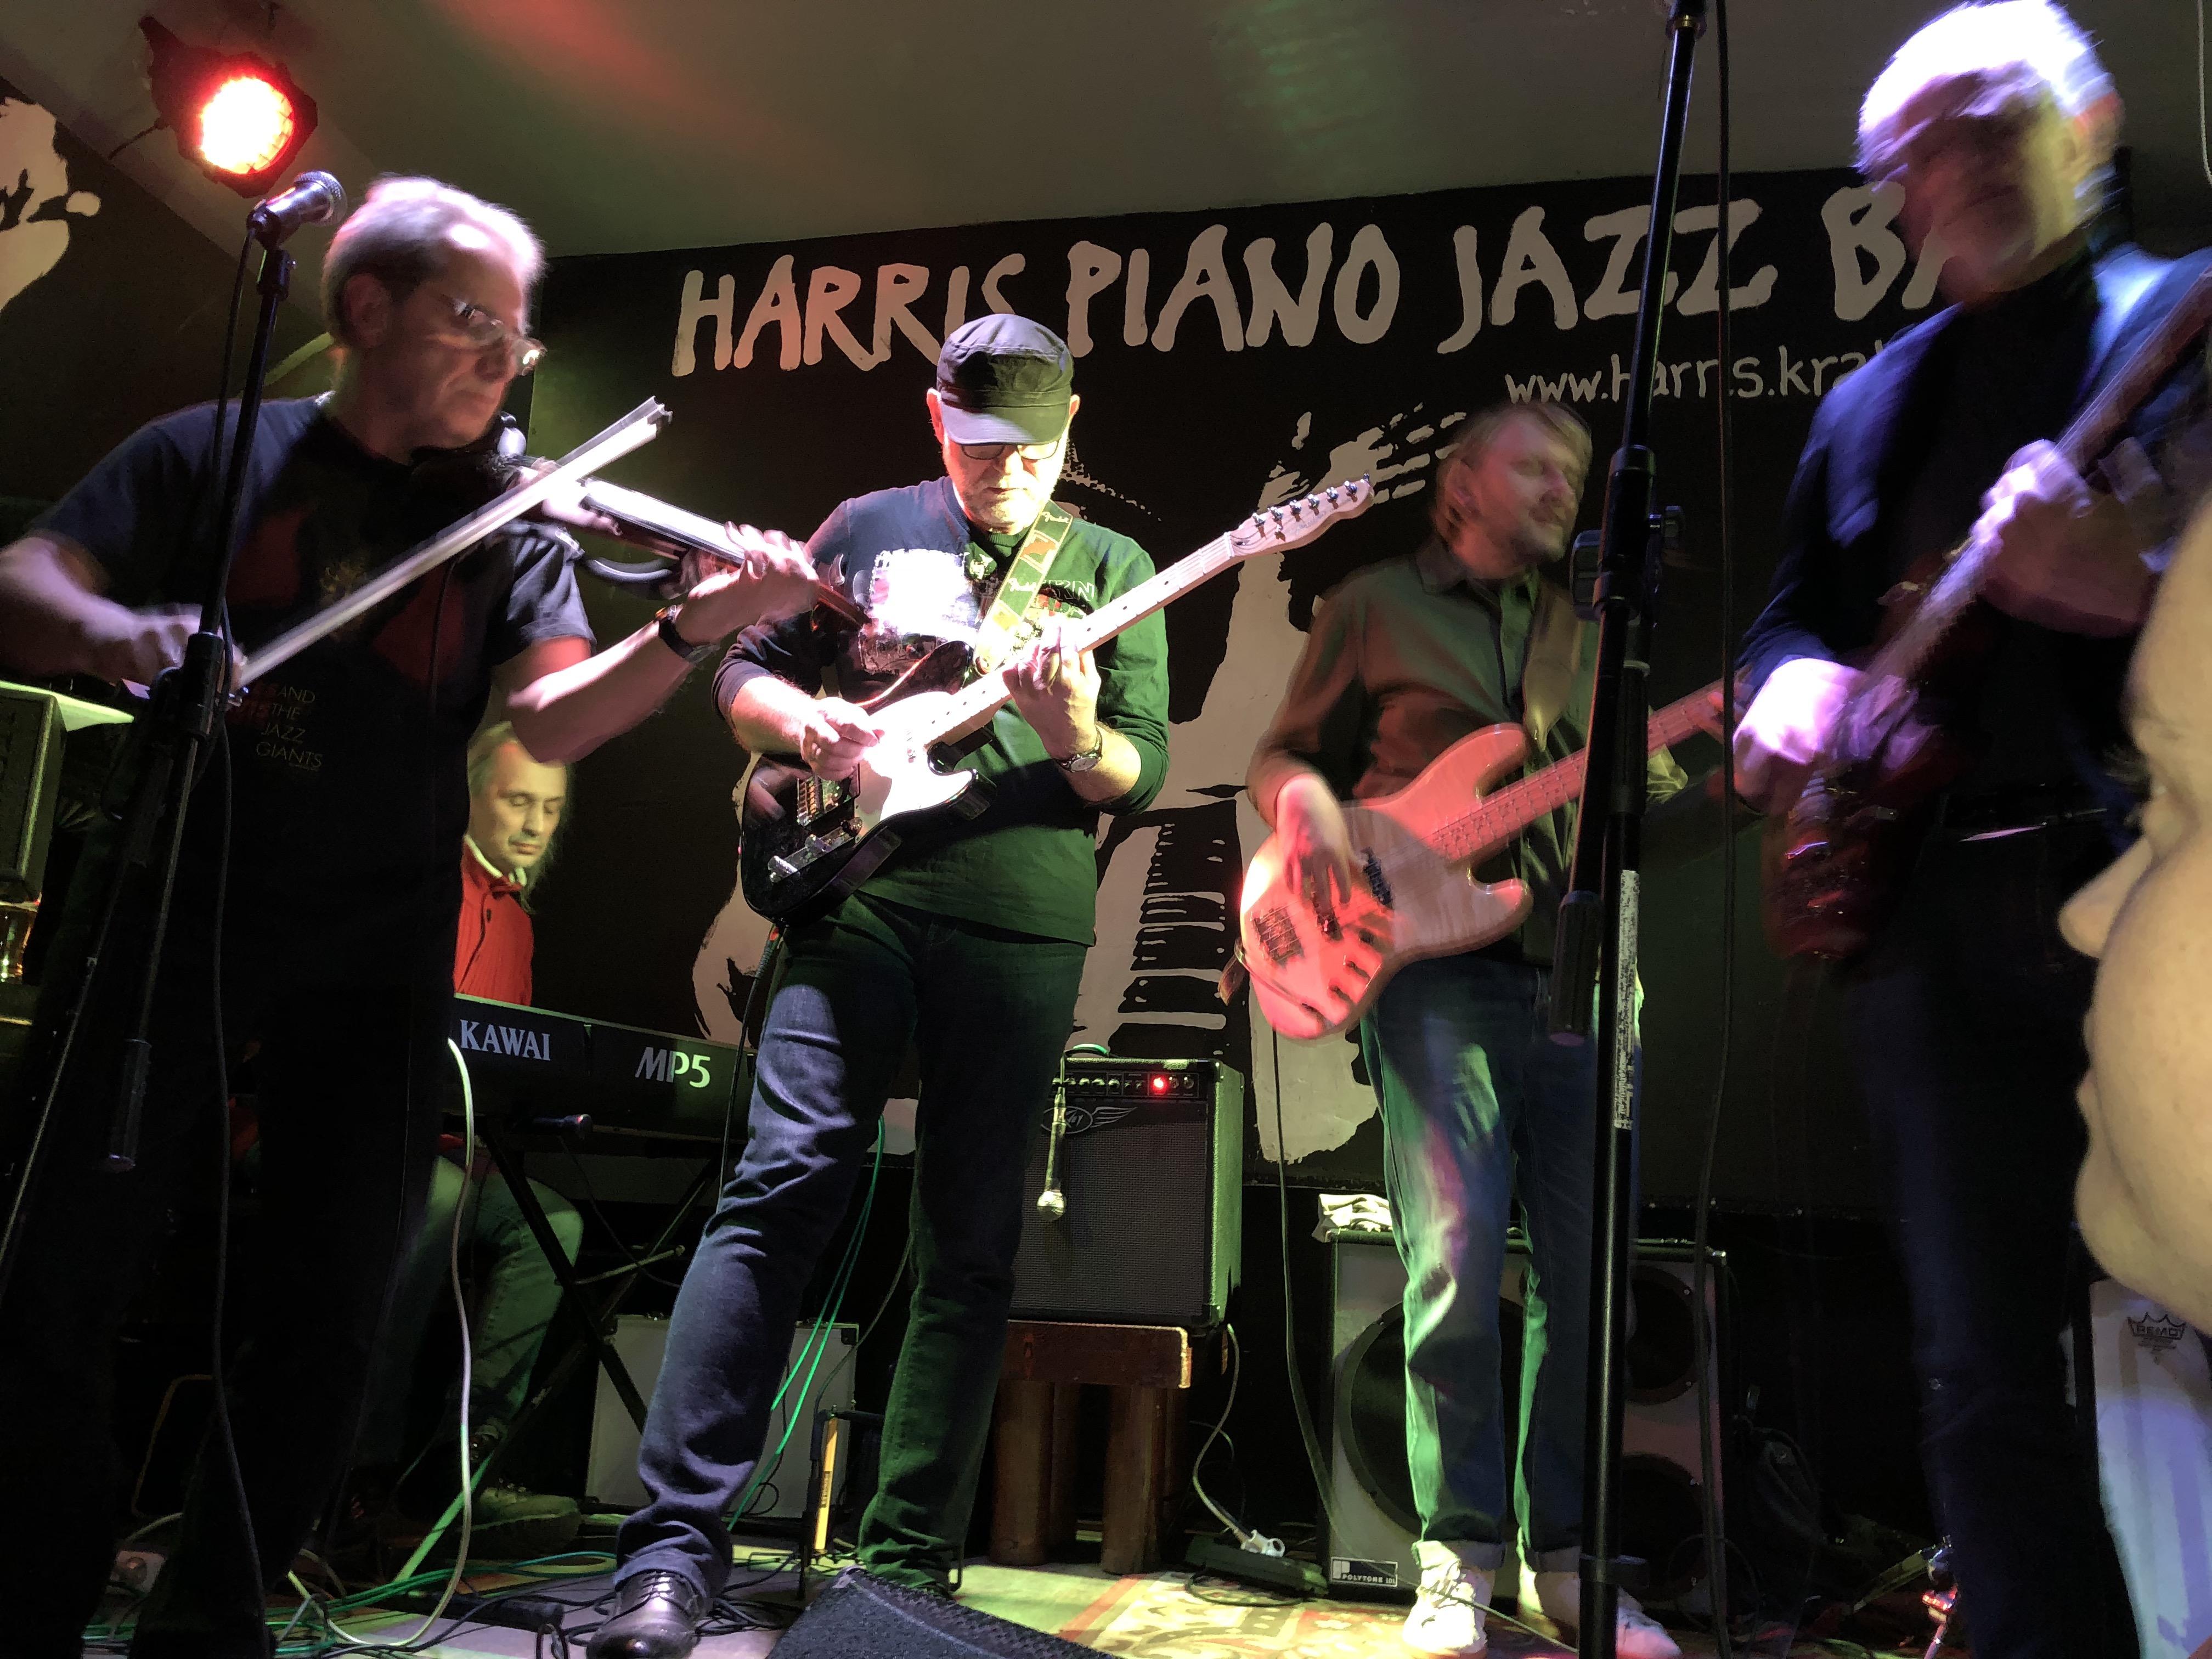 Harris Jazz